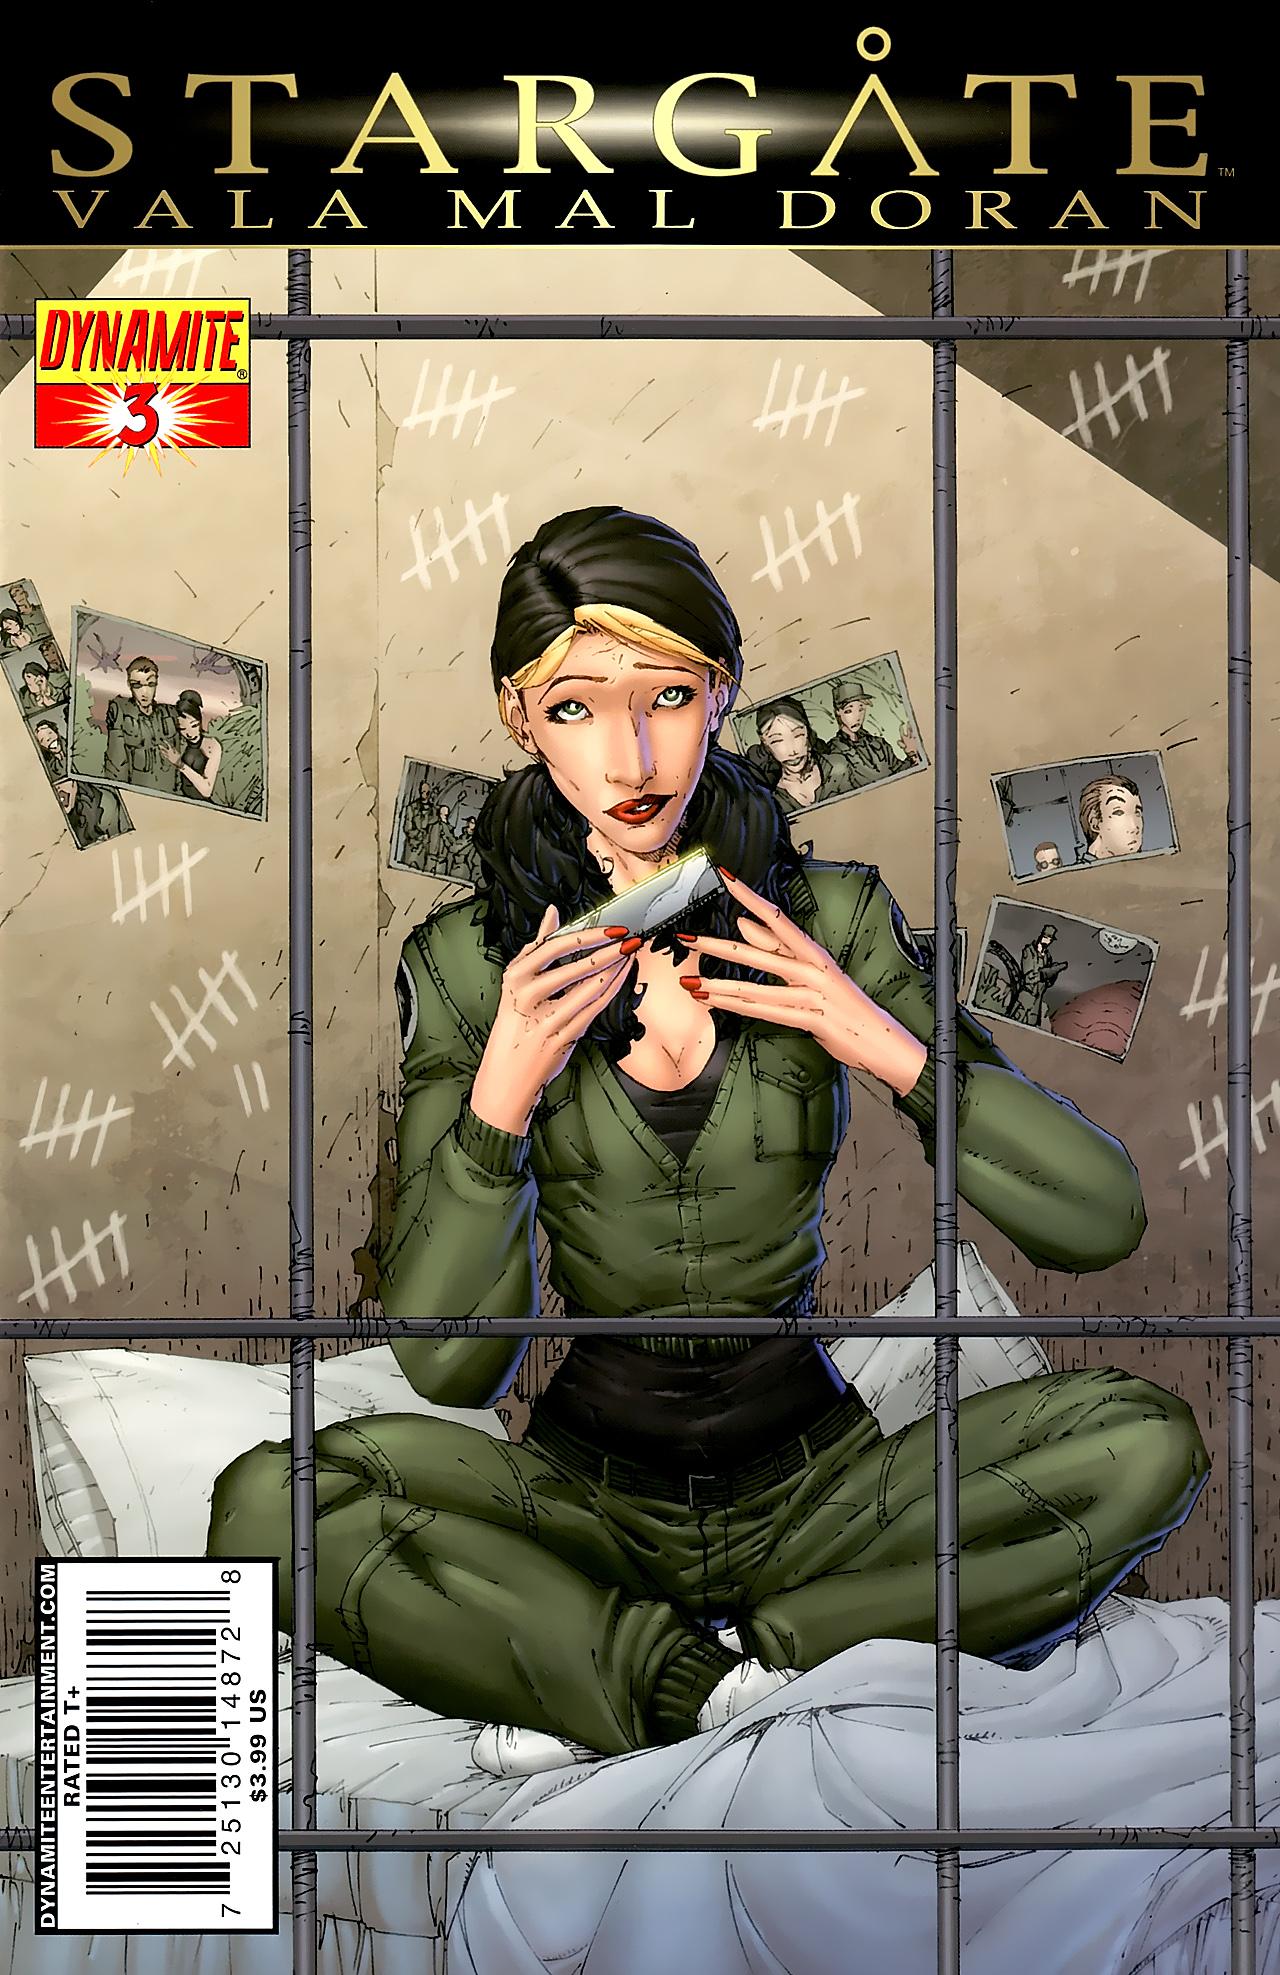 Read online Stargate Vala Mal Doran comic -  Issue #3 - 1